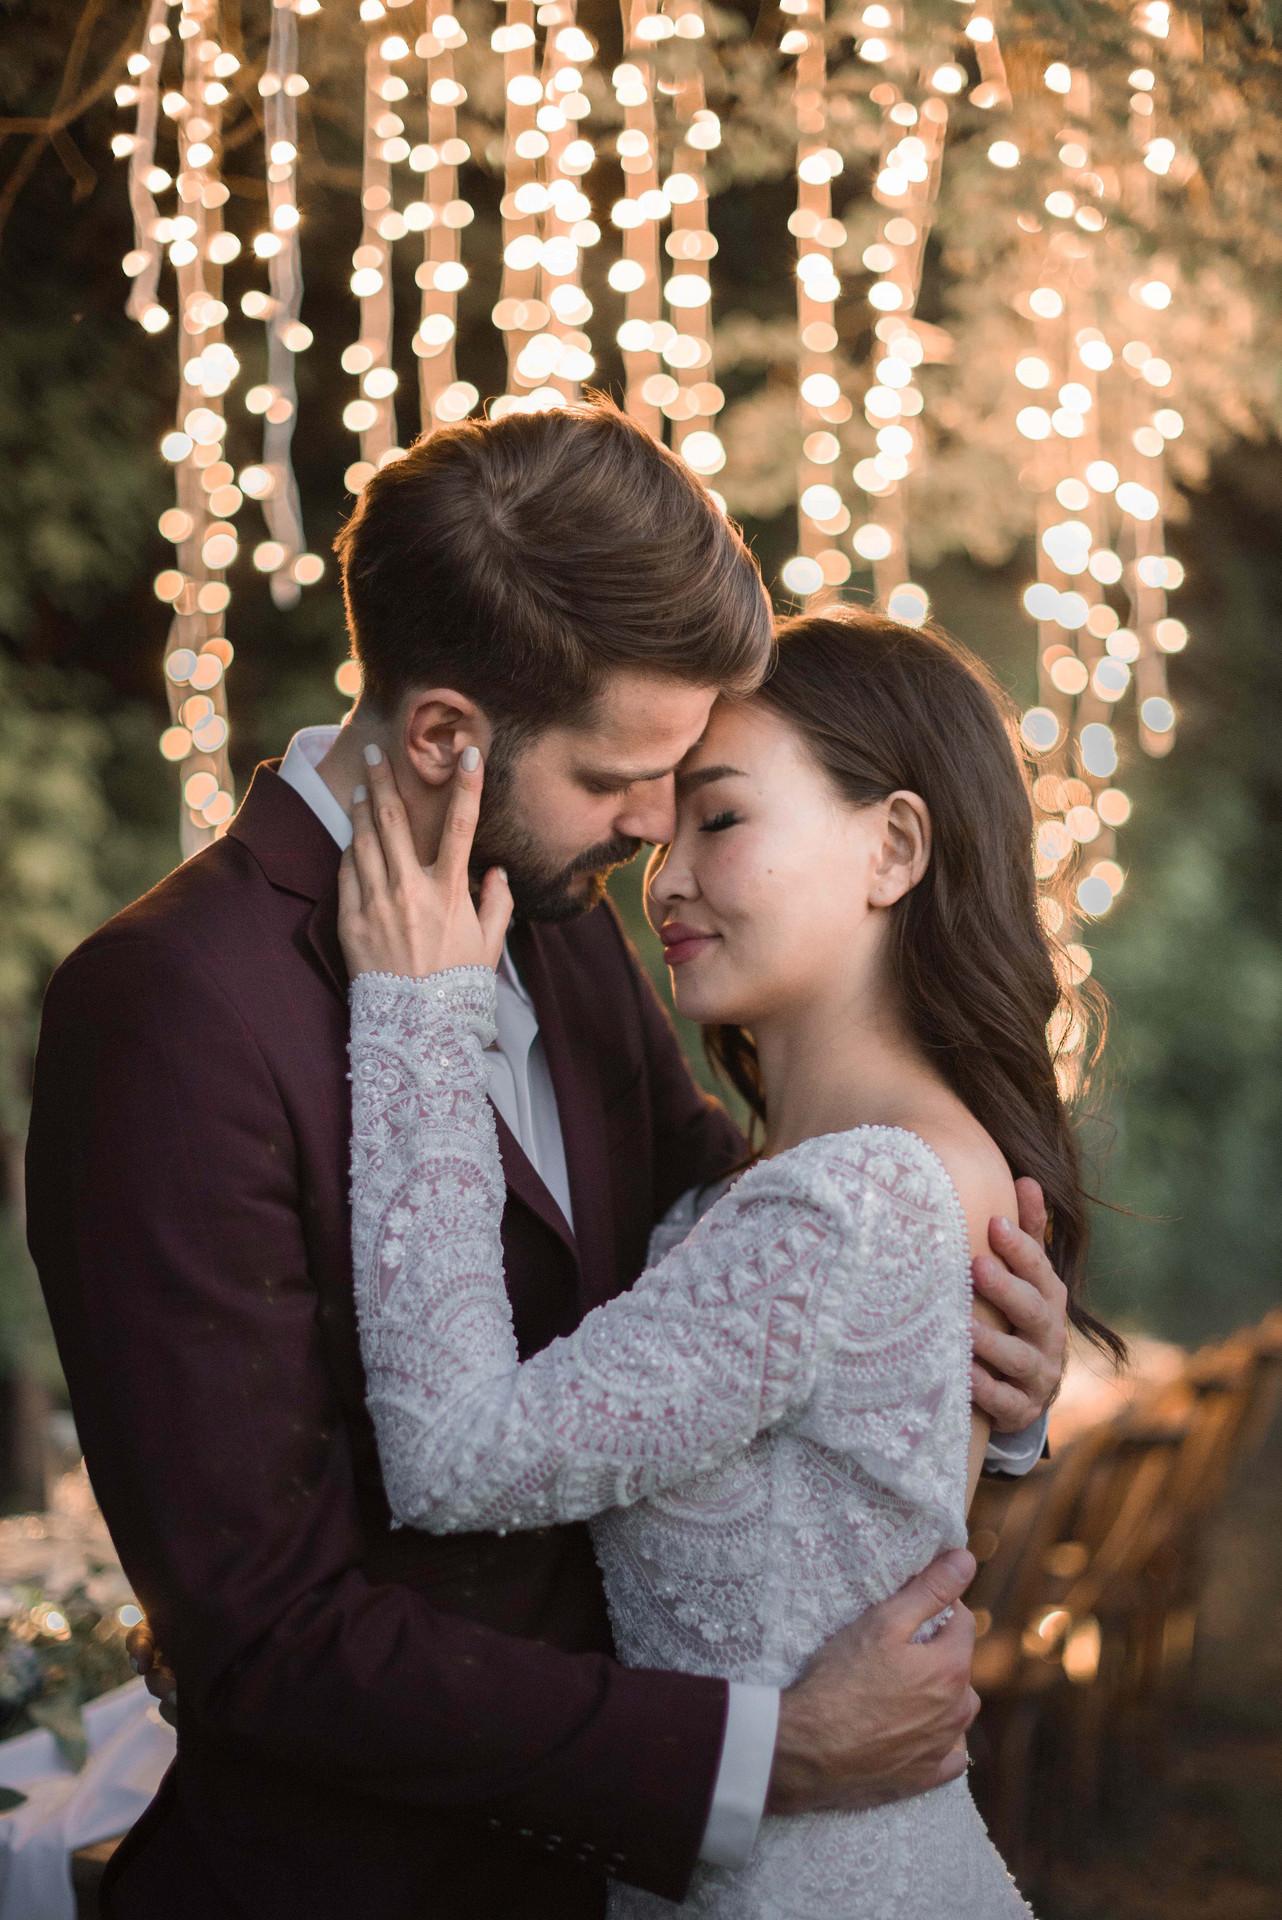 ślub i wesele zero waste